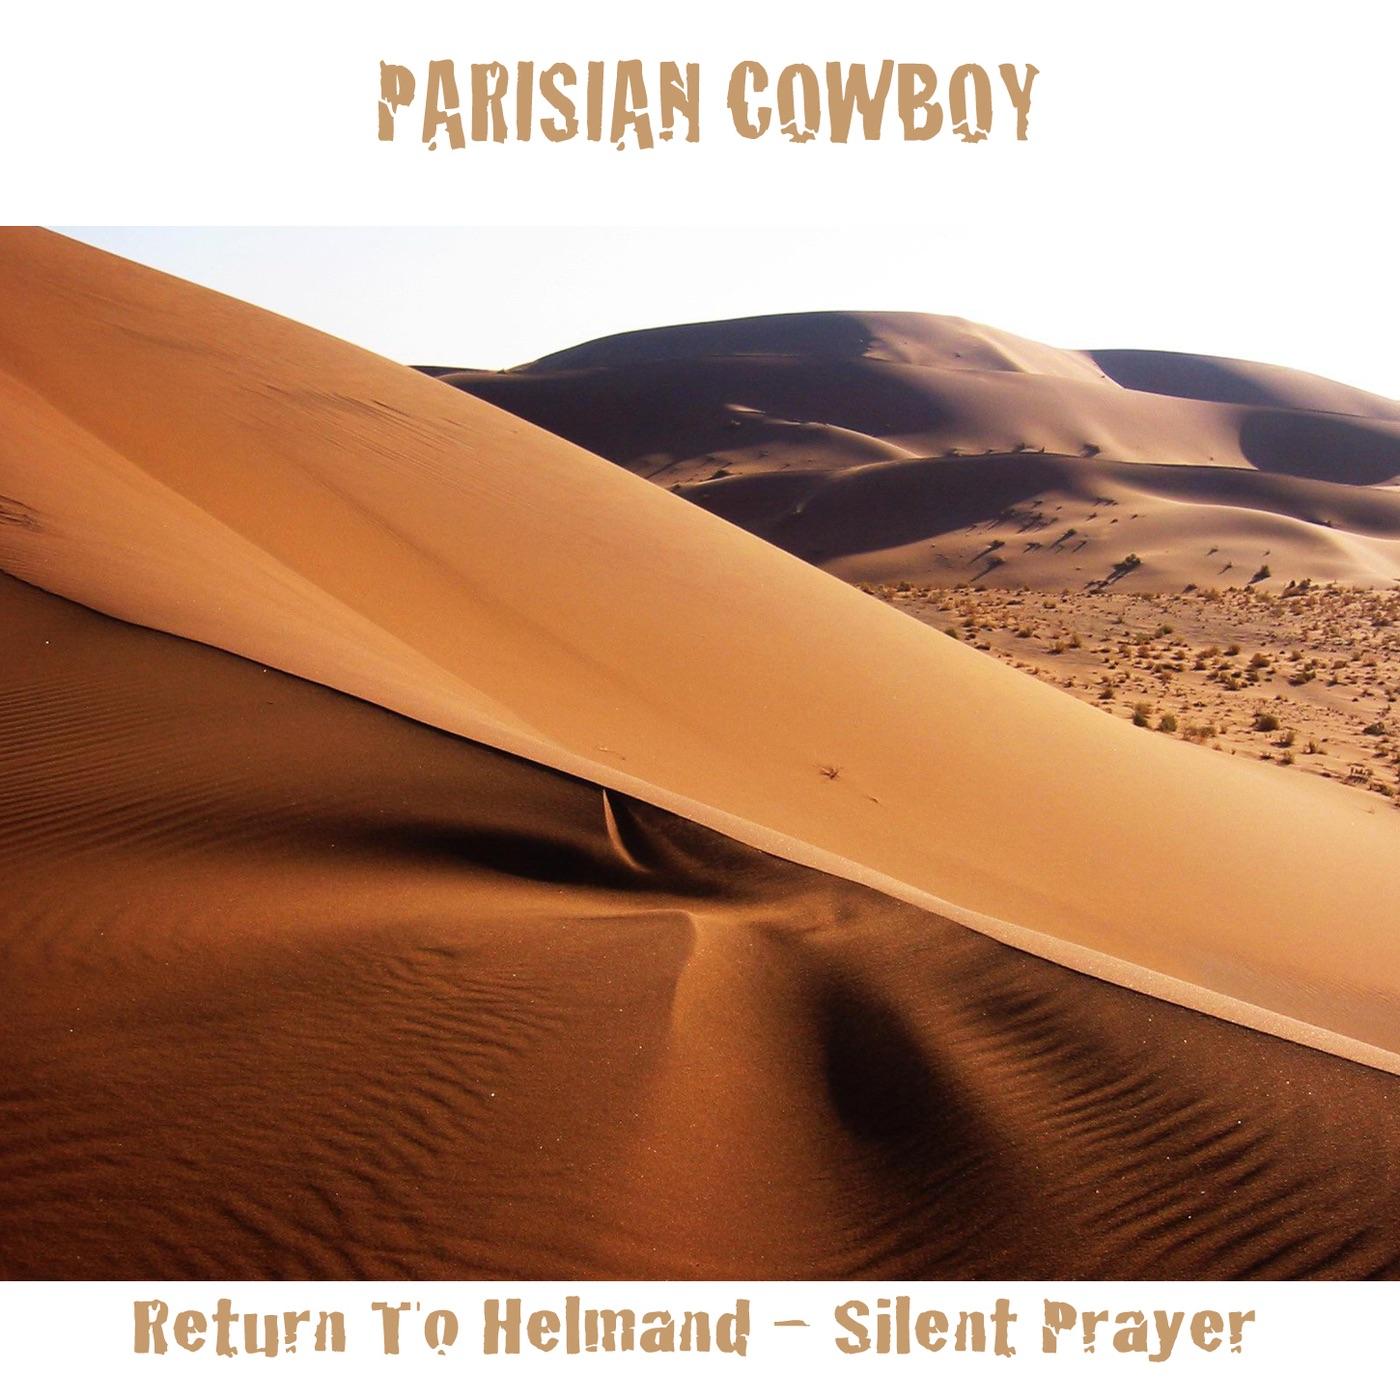 Return to Helmand (Silent Prayer)